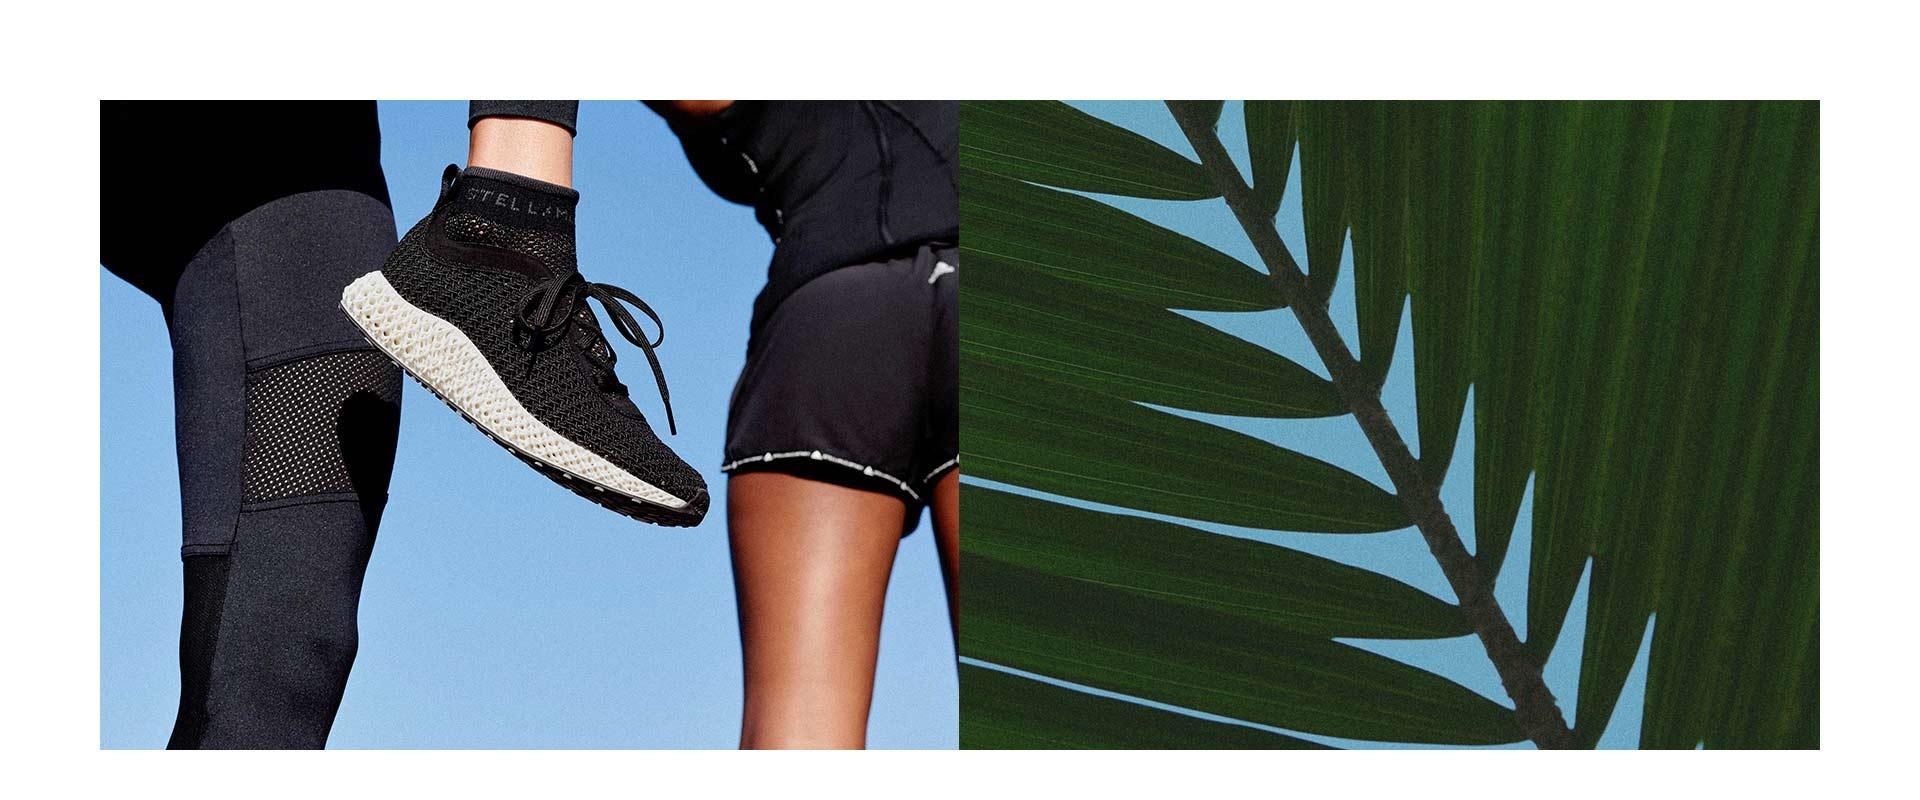 1b245f8ed1 Shop the adidas Stella McCartney Collection | Free Shipping & ...